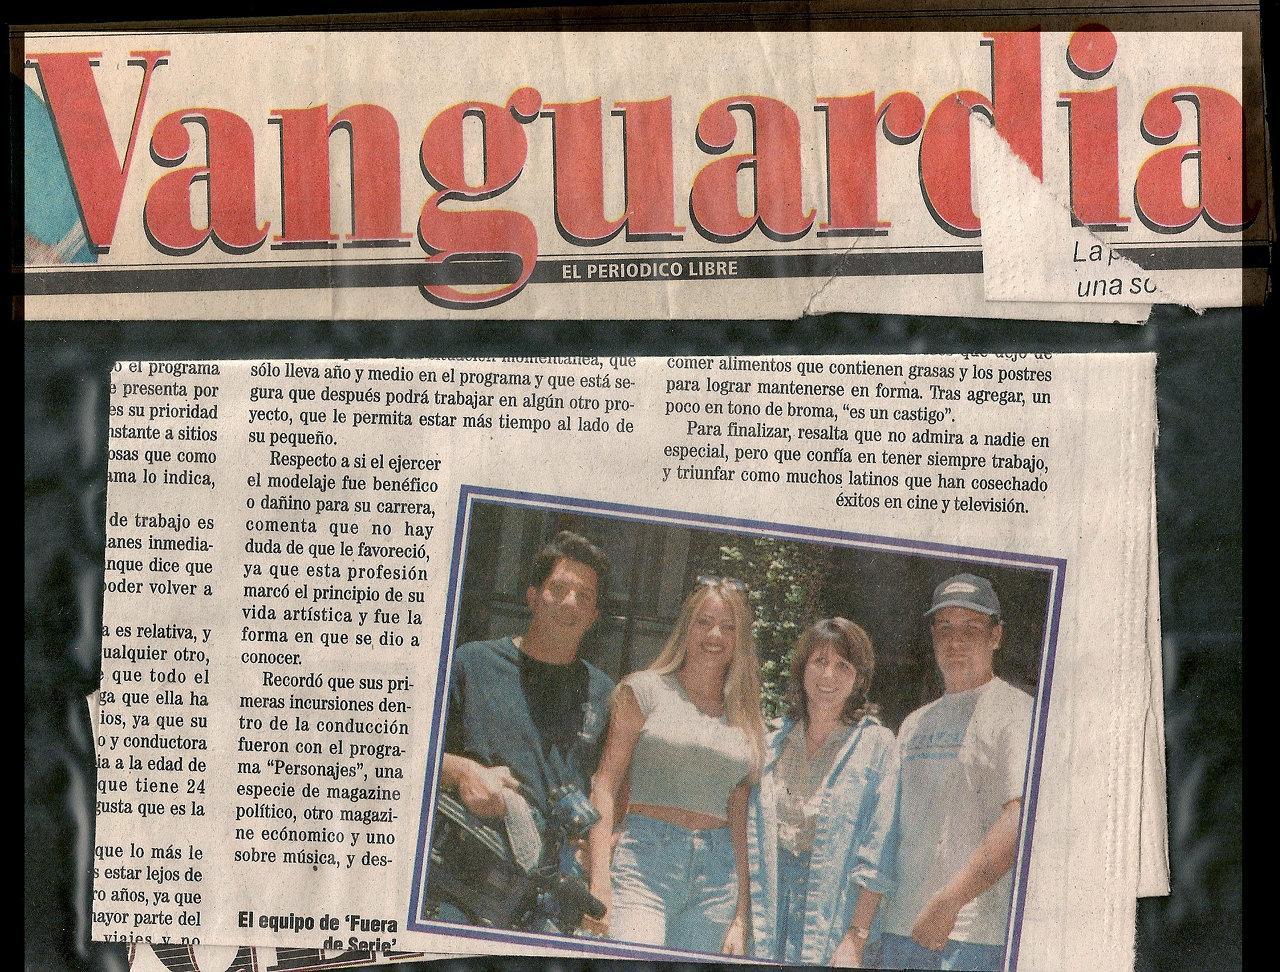 Vanguardia - Sofia Vergara